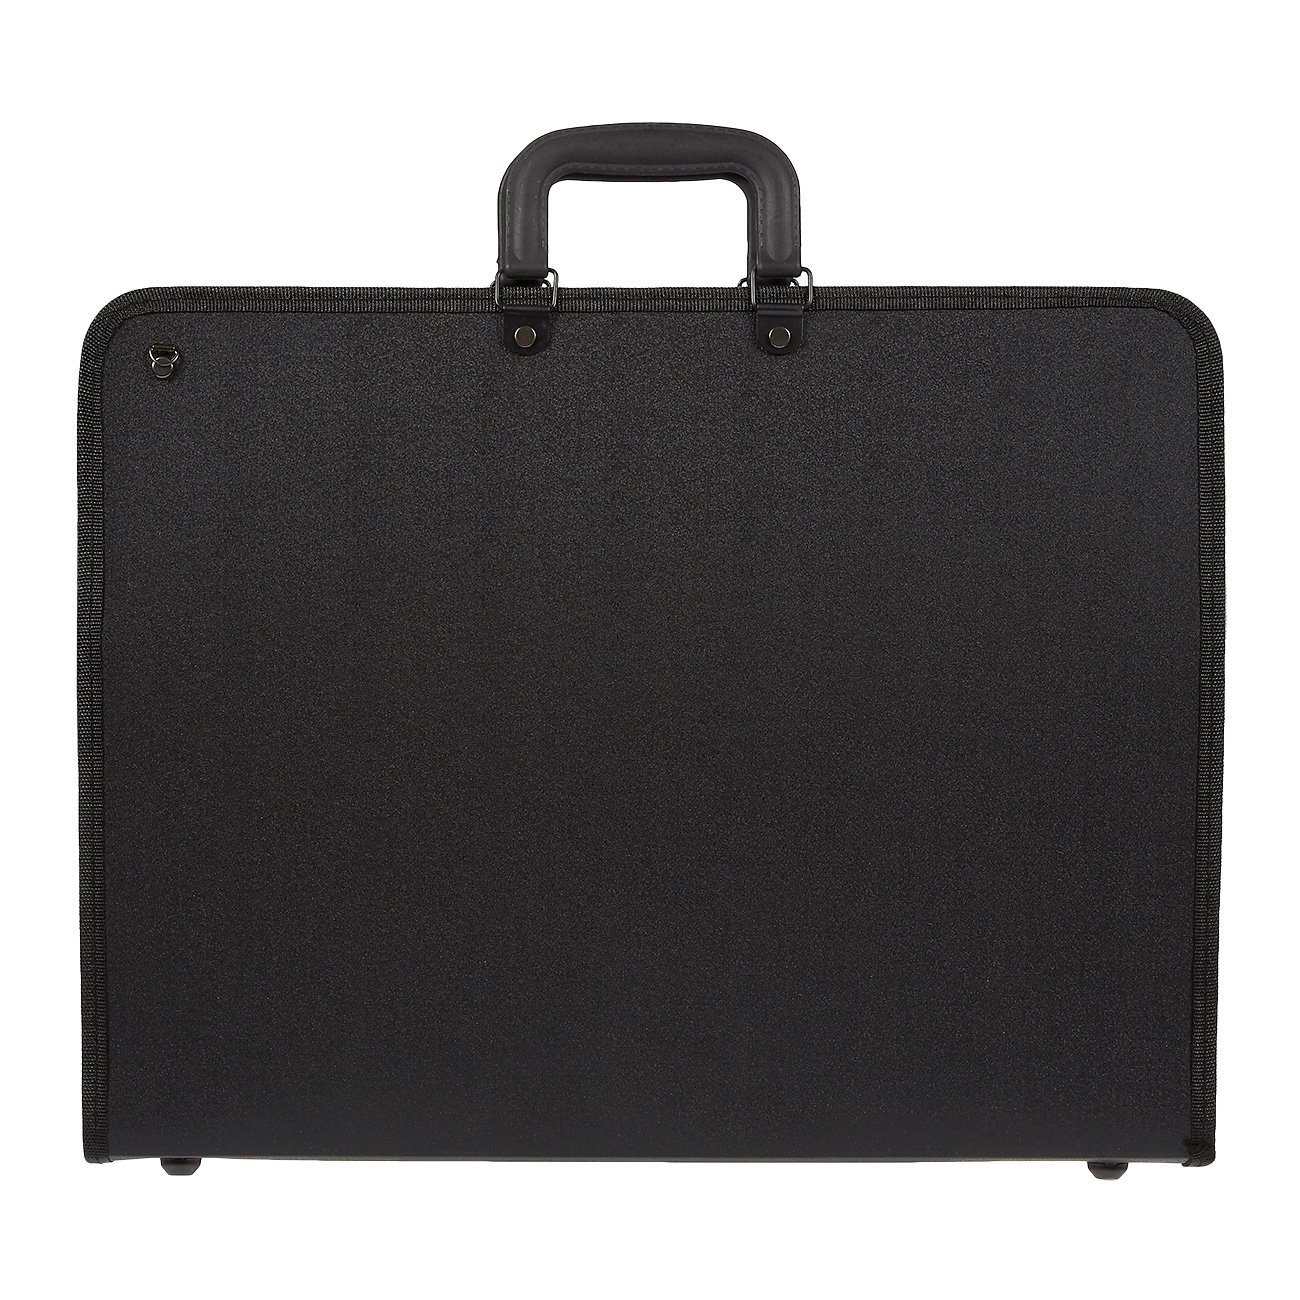 Artist Portfolios Case Artist Carrying Case with Shoulder Strap 34.5 x 23 x 1.5 inches Art Portfolio Case Black